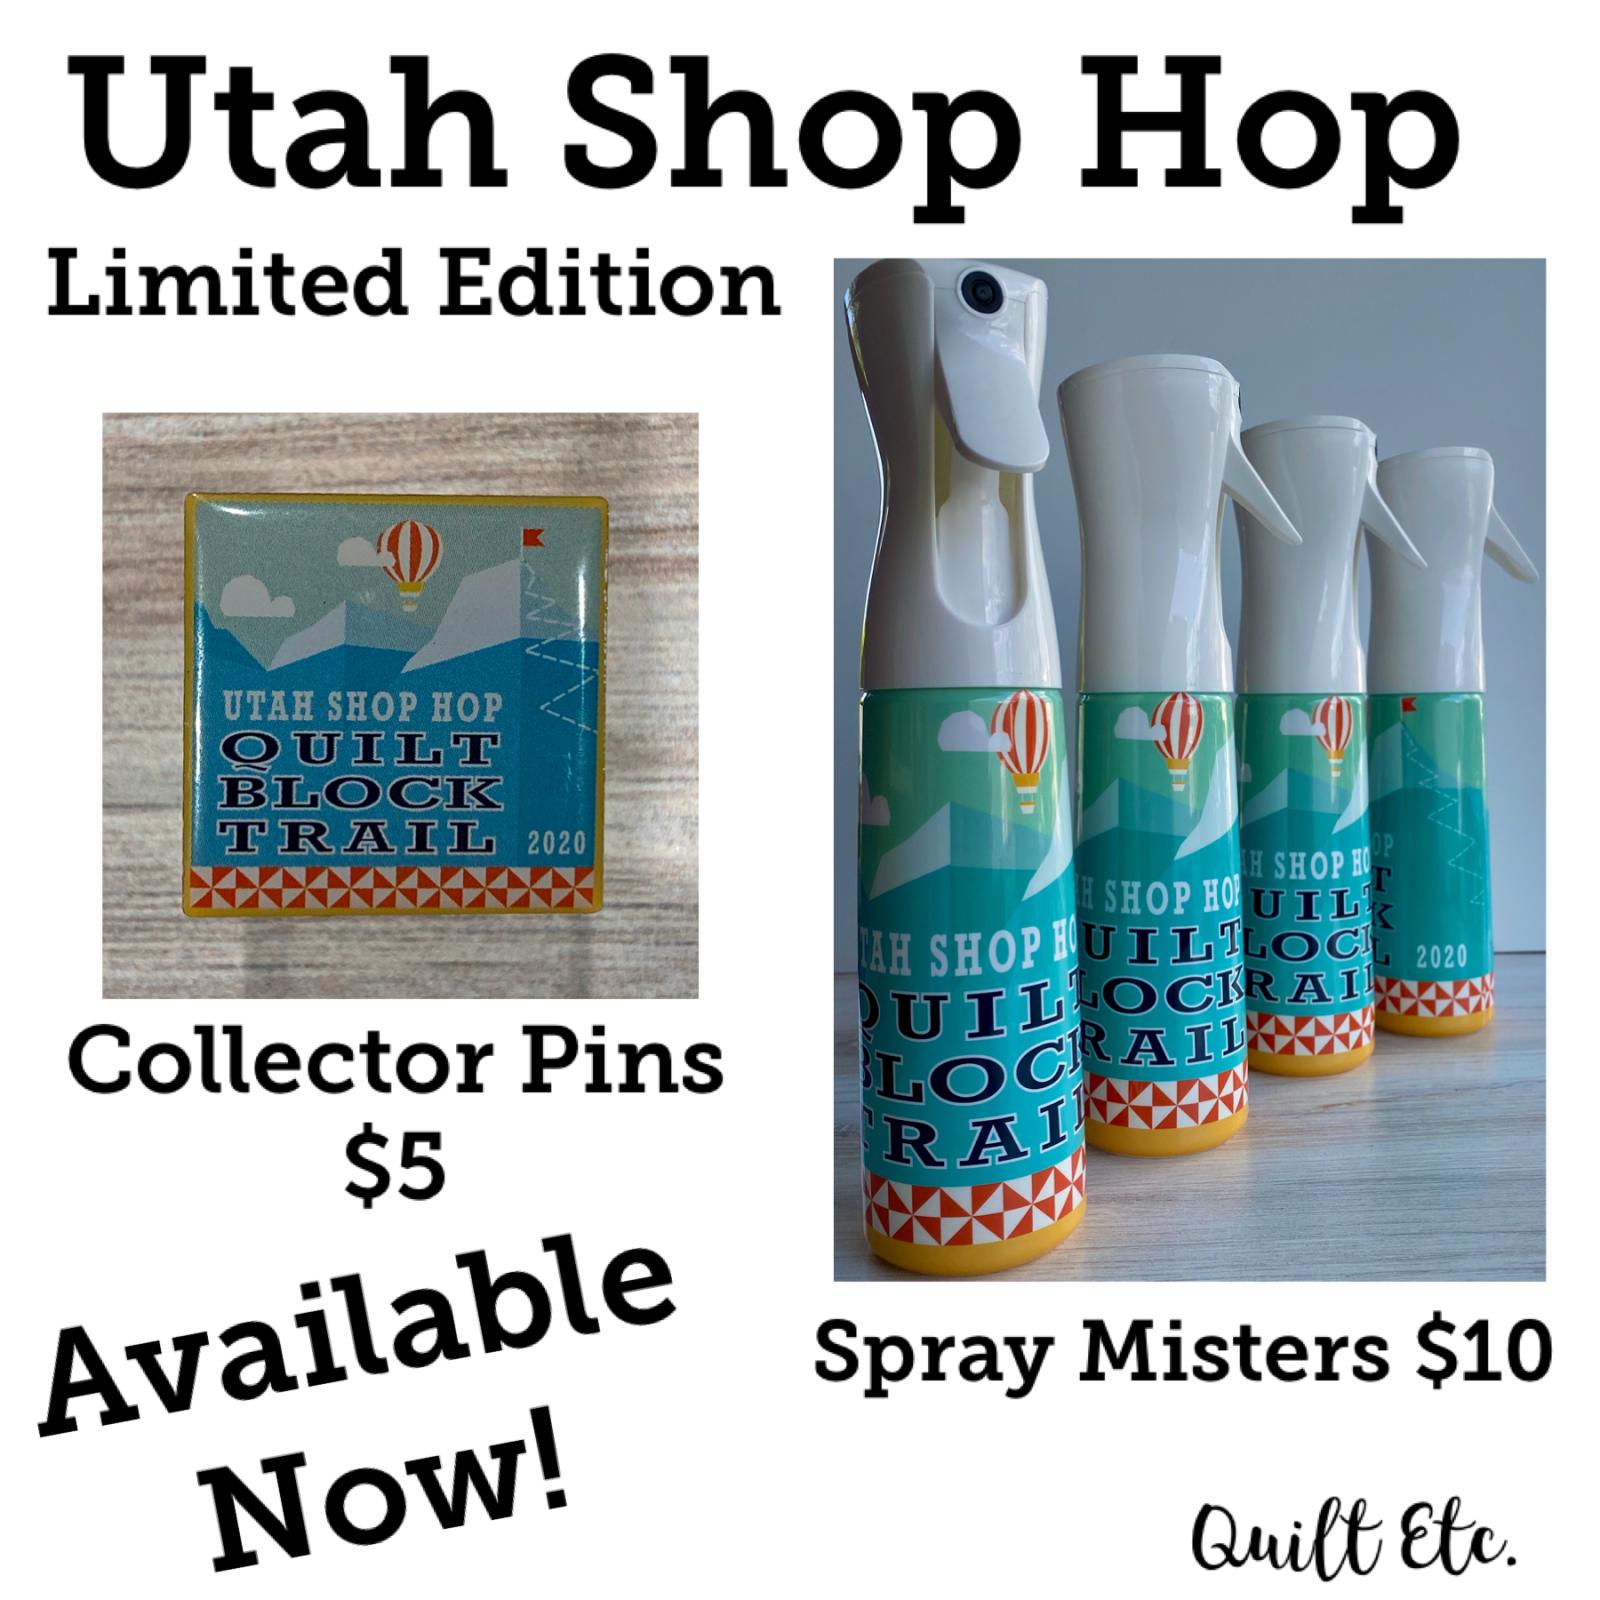 Utah Shop Hop Limited Edition